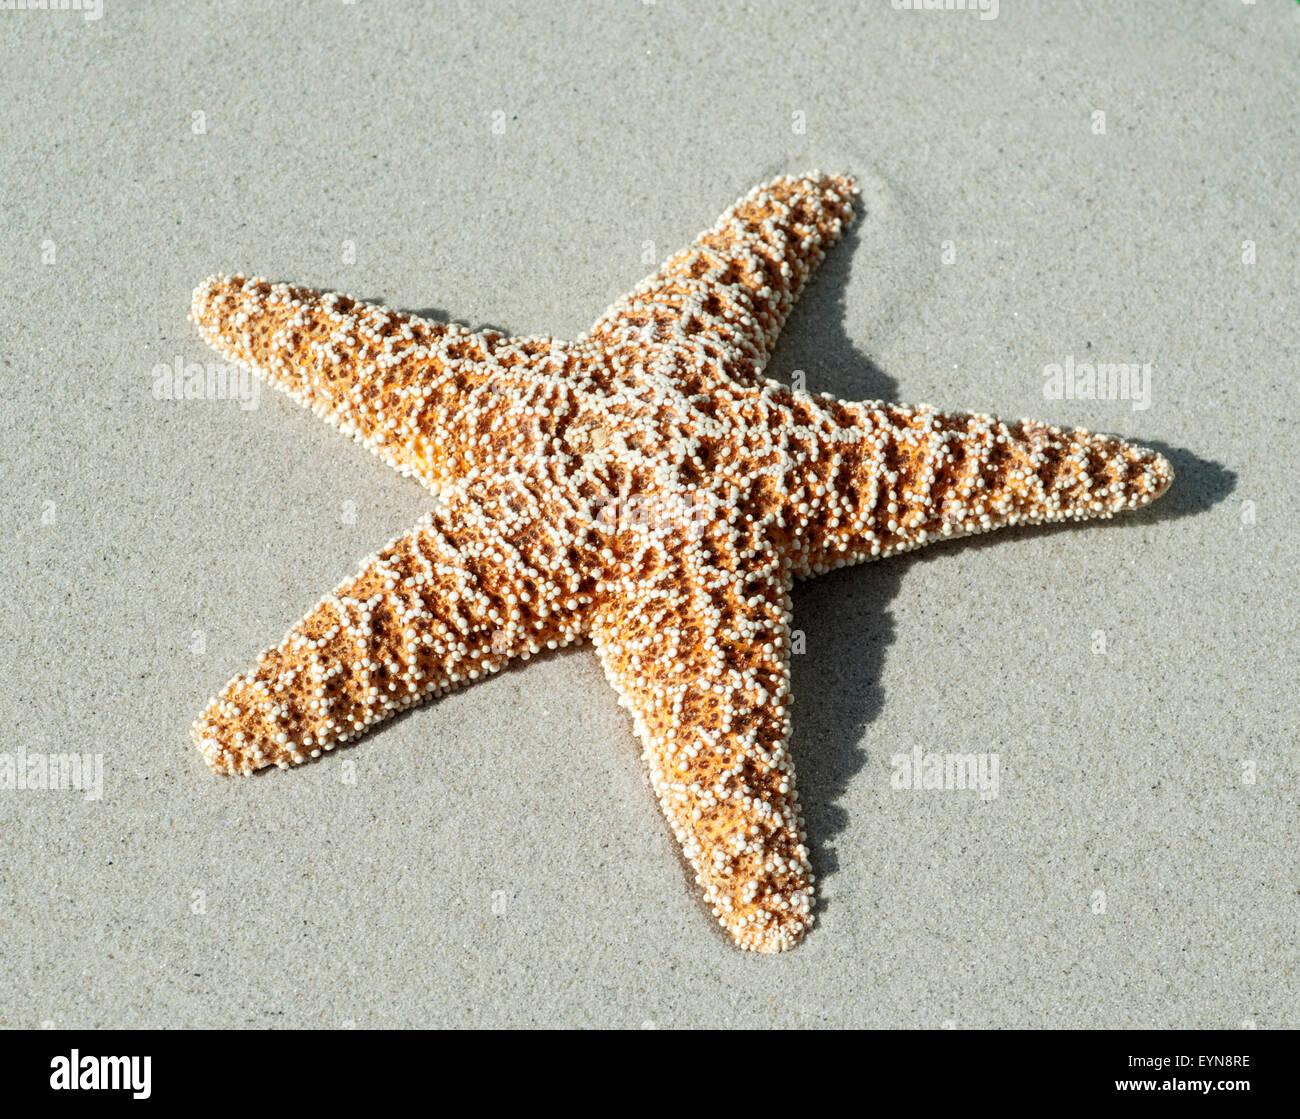 Seestern, Asteroidea, - Stock Image